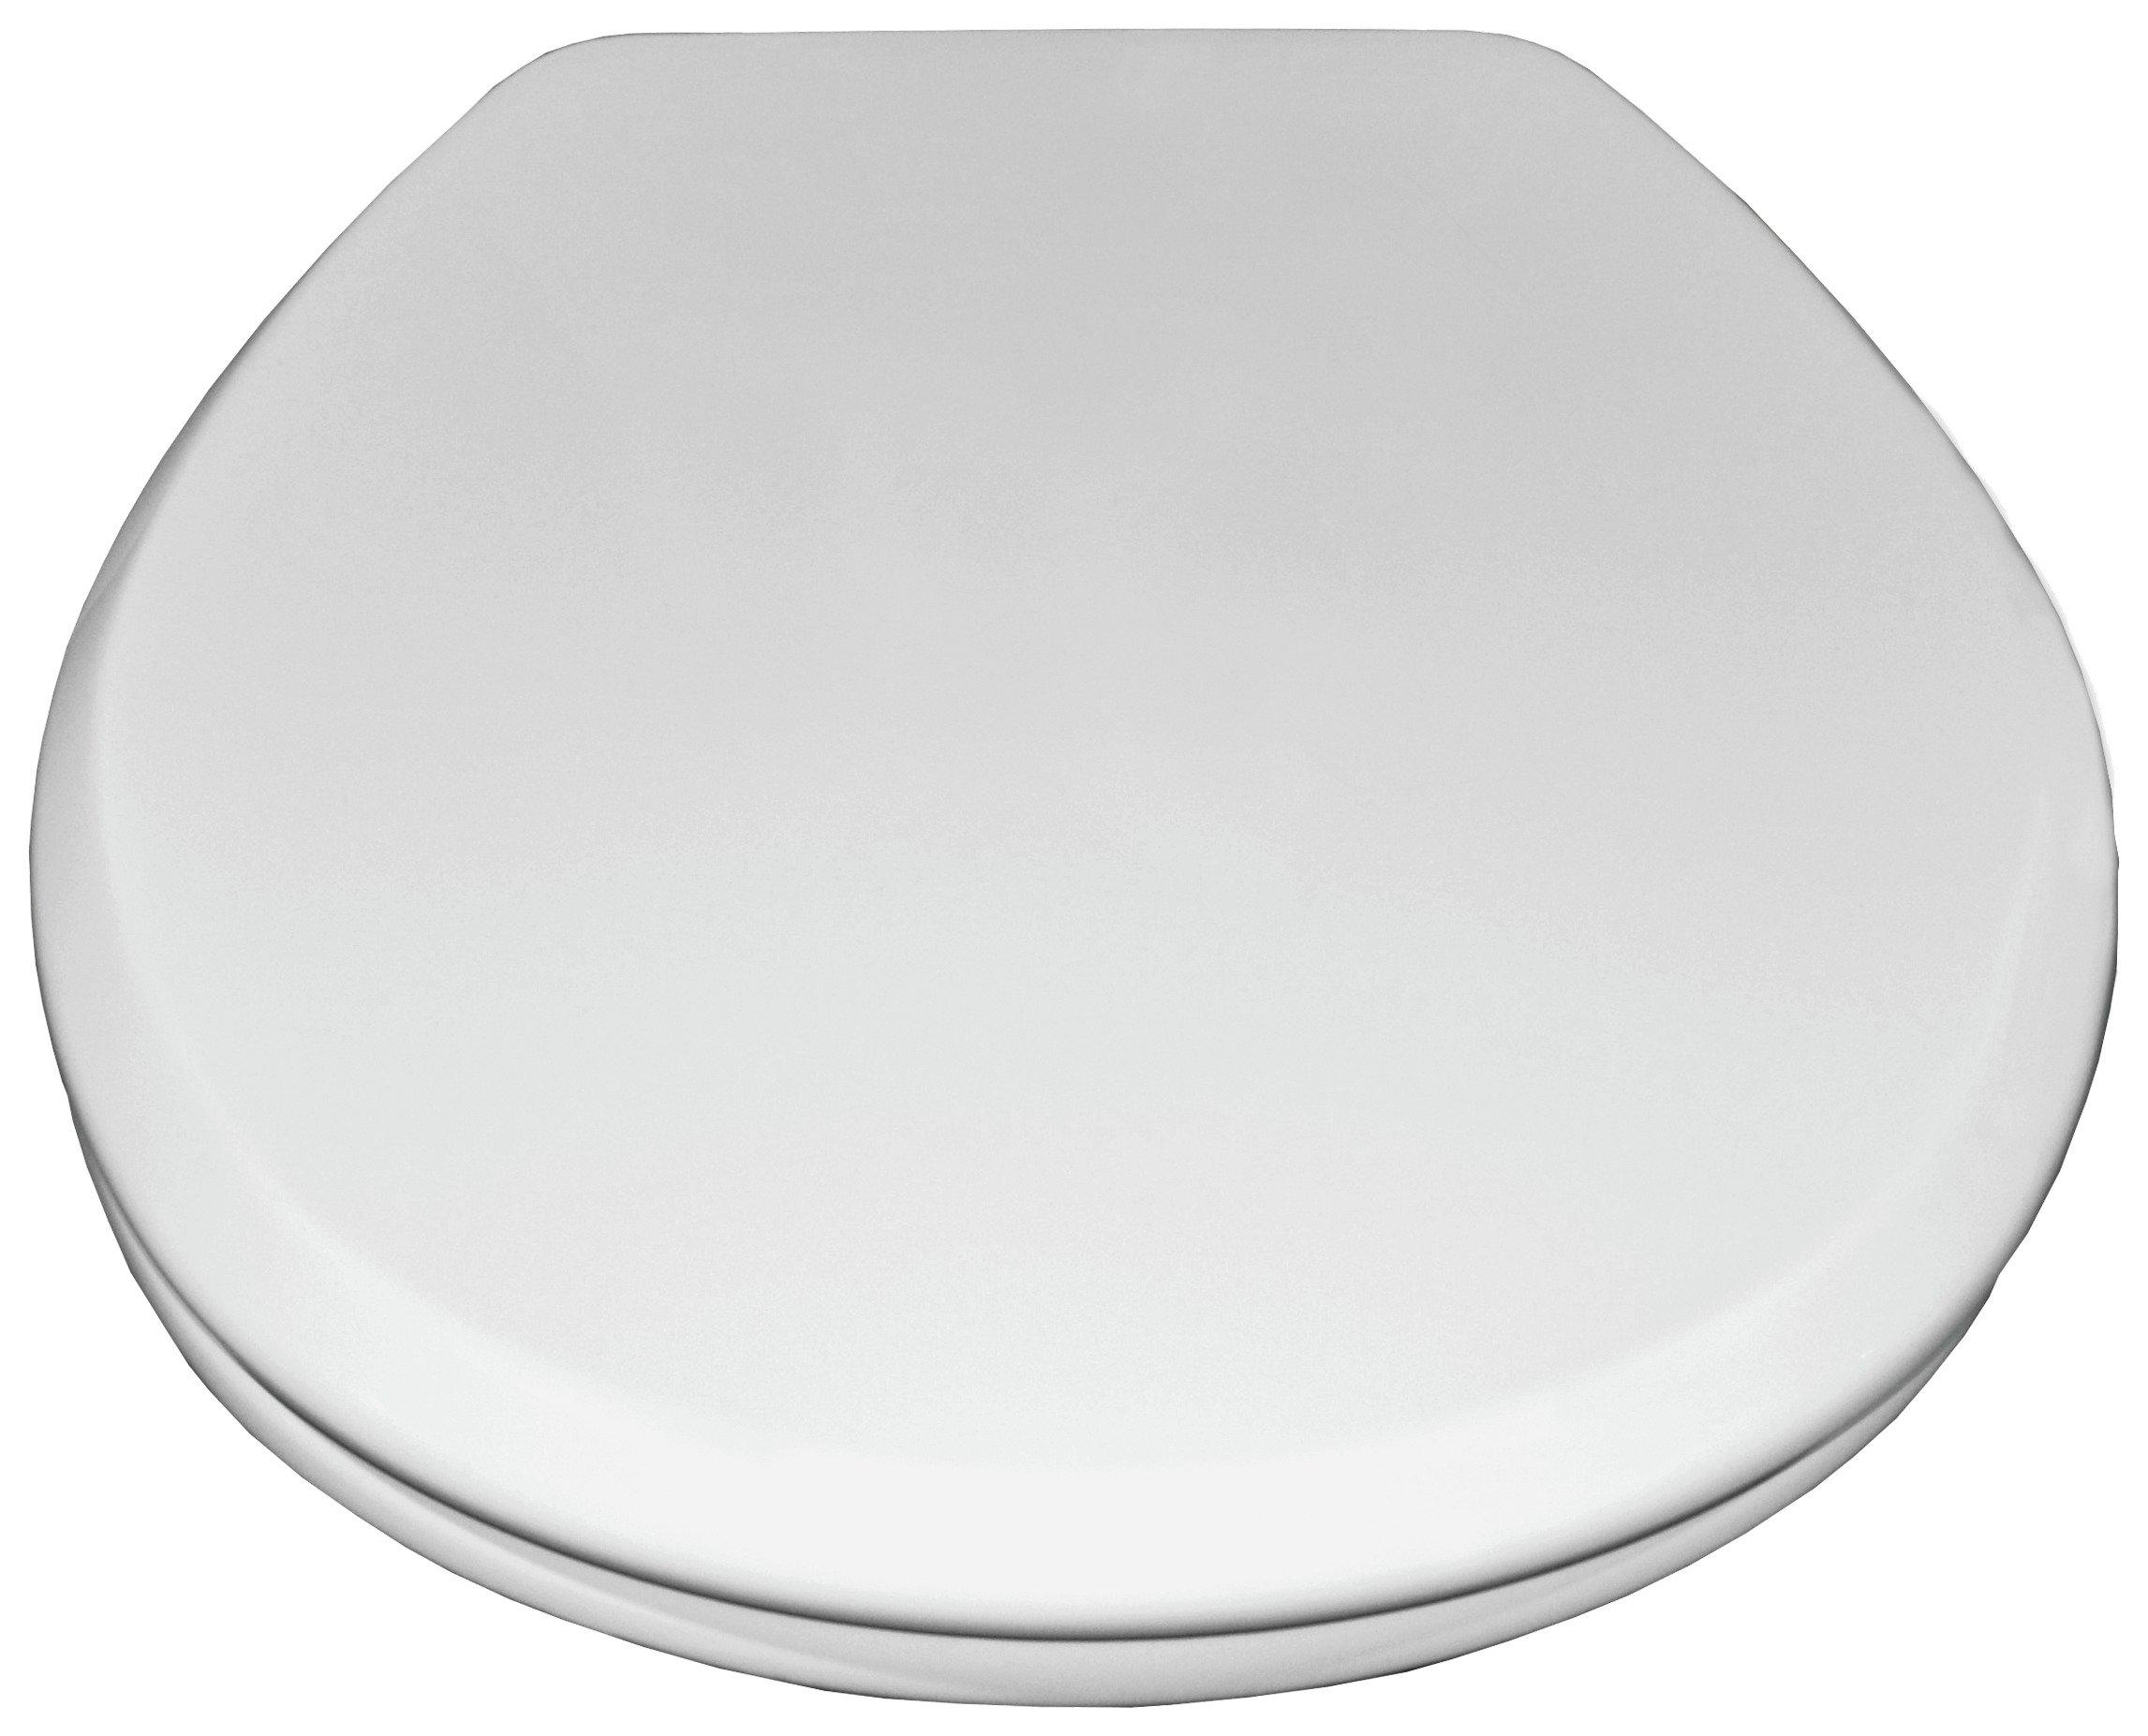 Bemis Memphis Statite Slow Close Toilet Seat - White